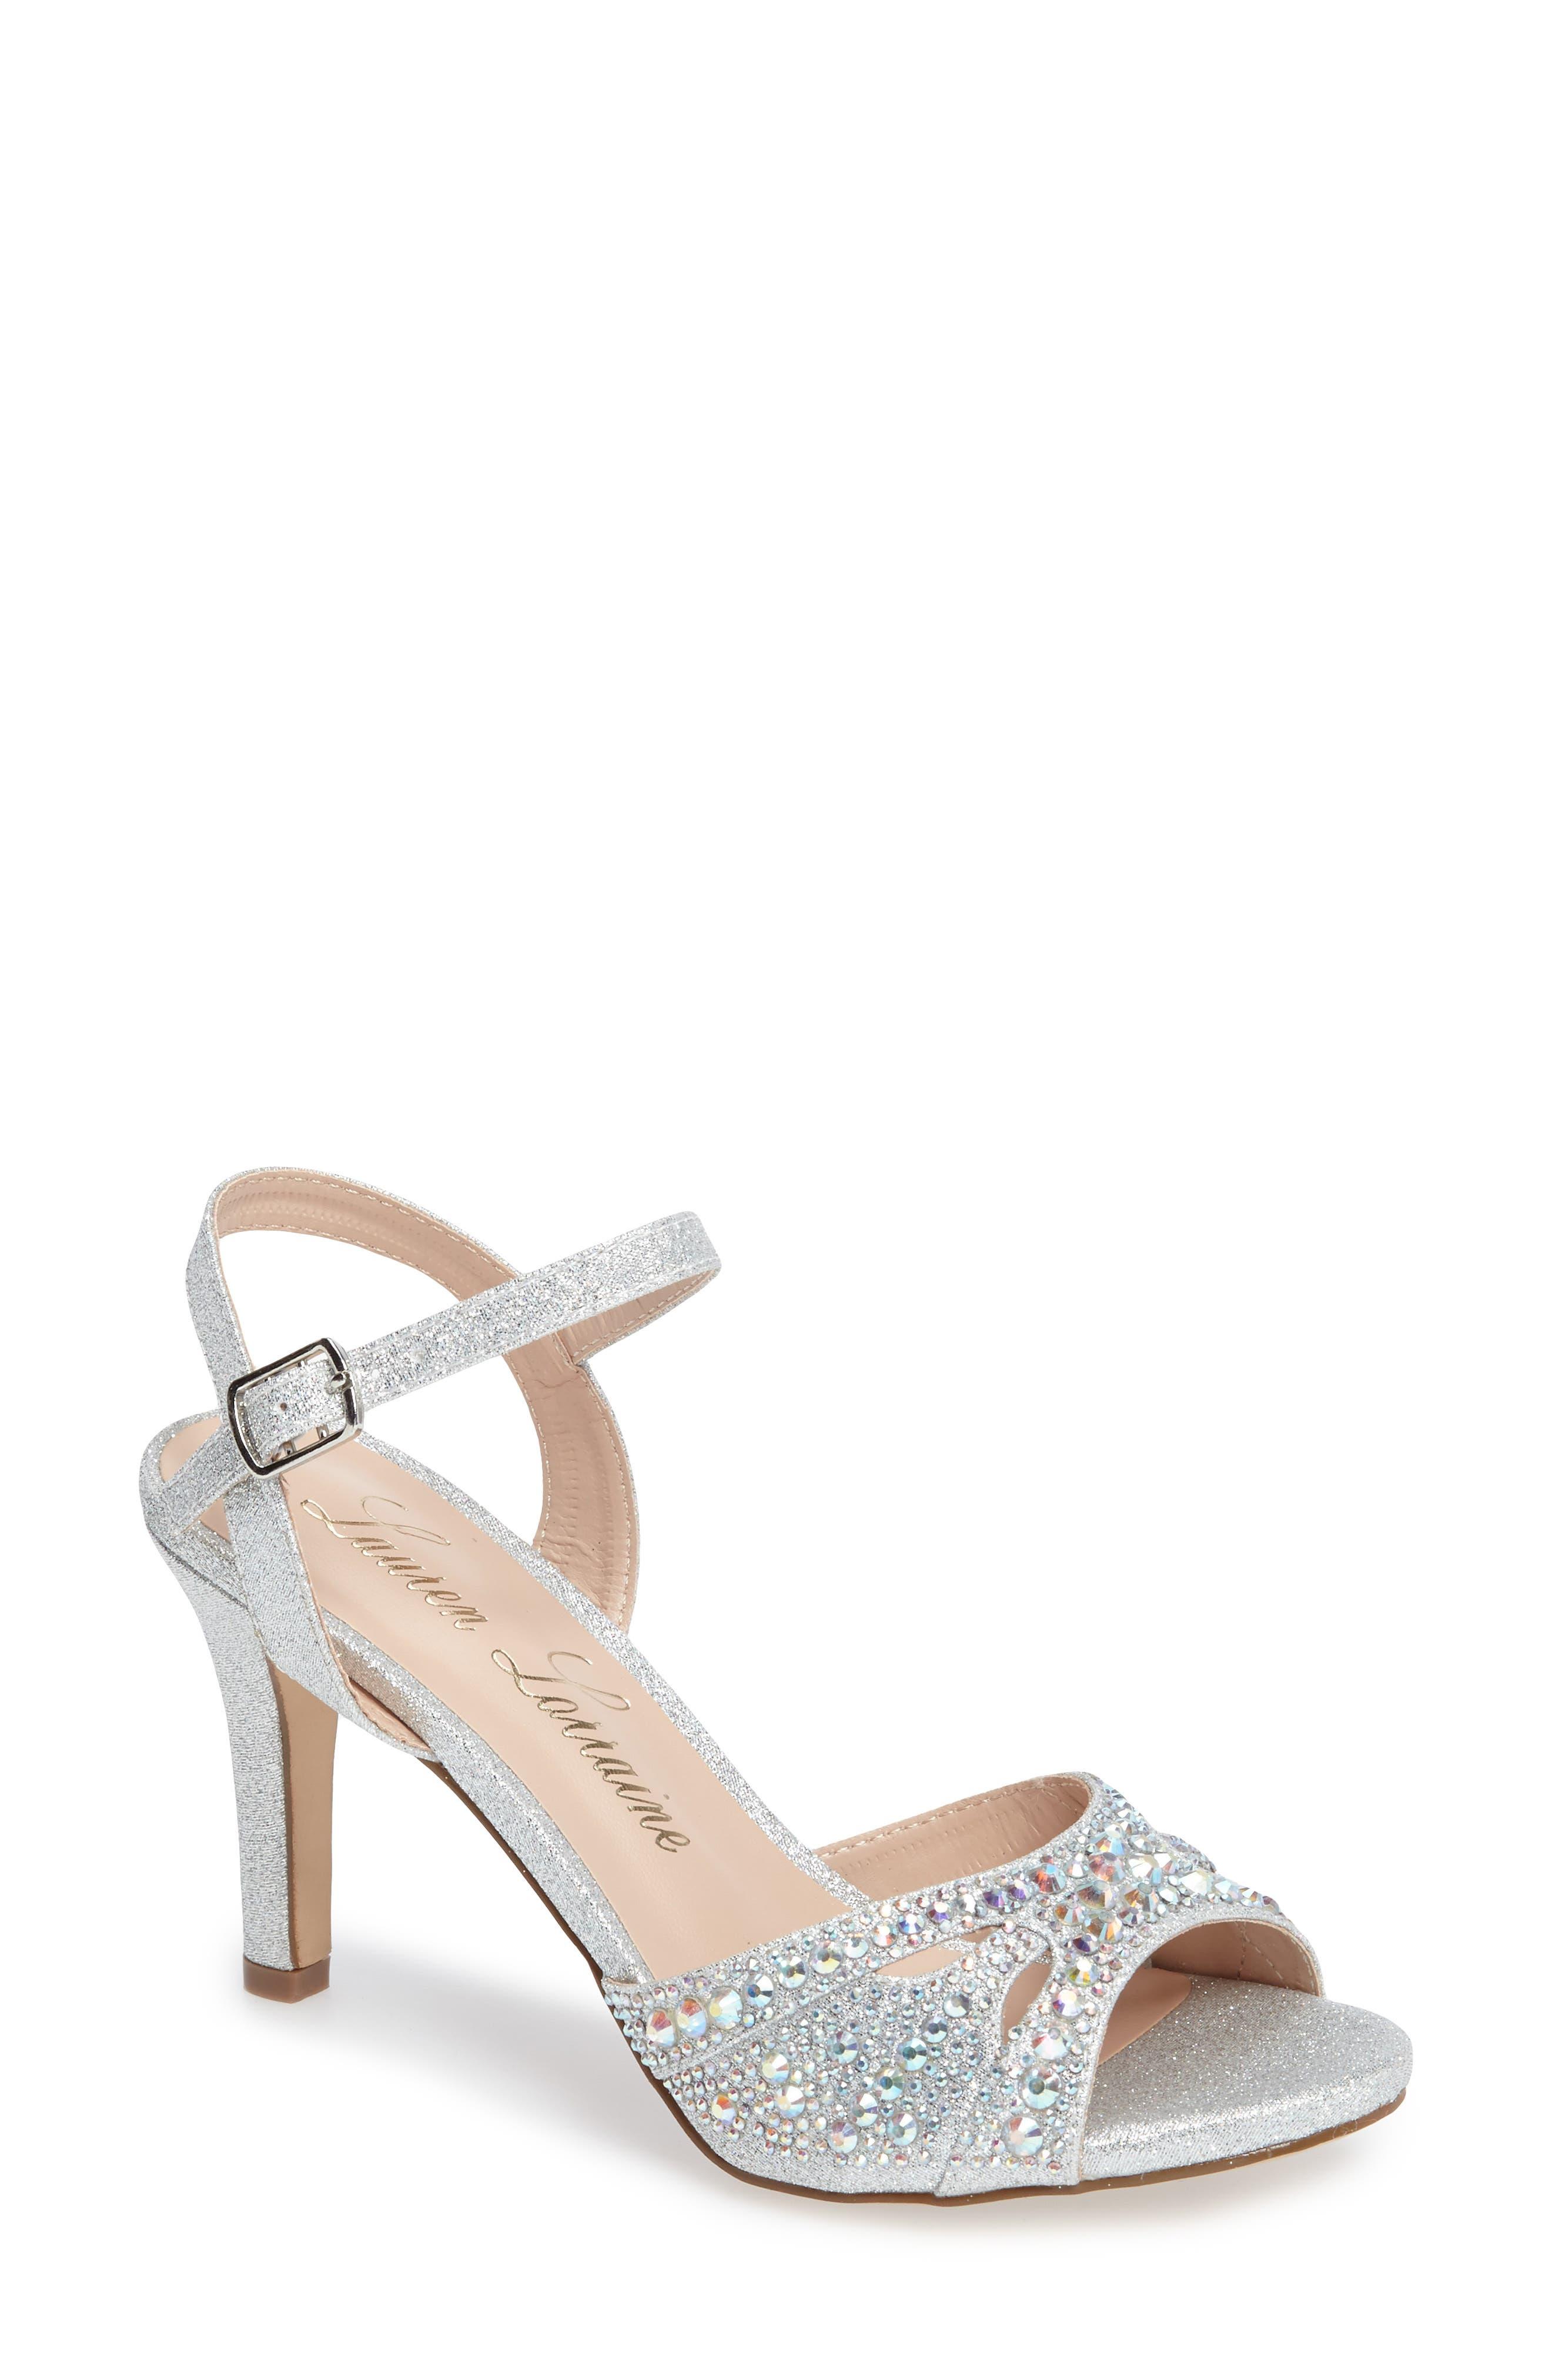 Lauren Lorraine Florence Crystal Embellished Sandal (Women)